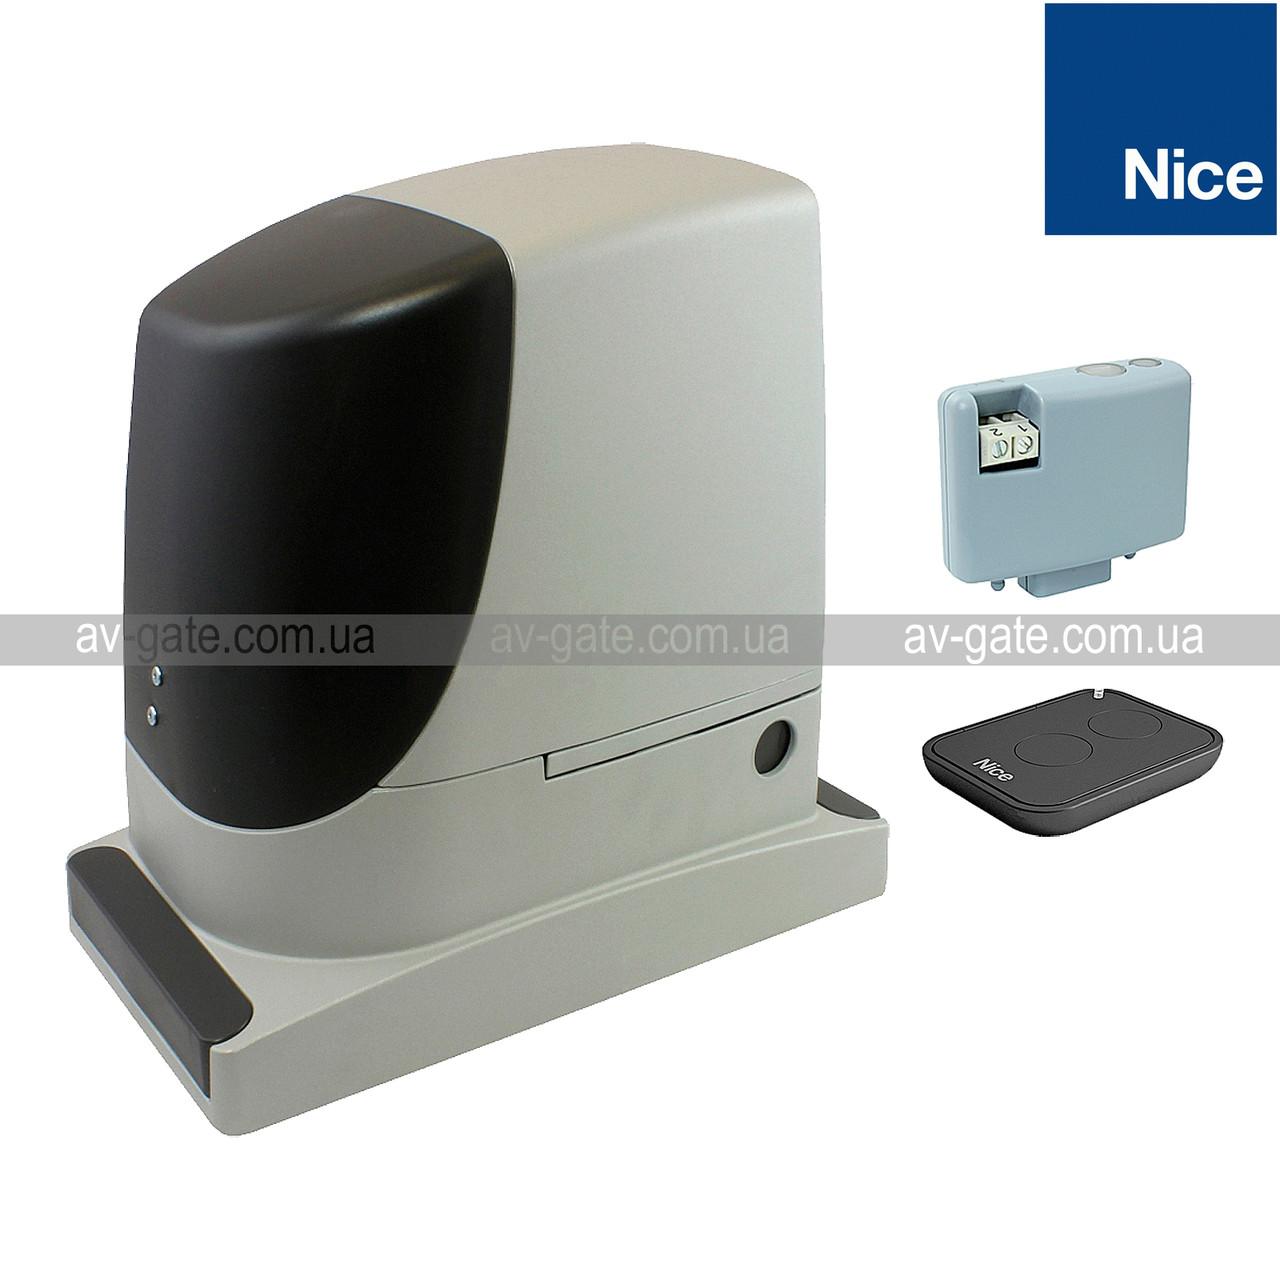 Комплект автоматики RUN1800KCE Nice для откатных ворот (ширина до 15 м)